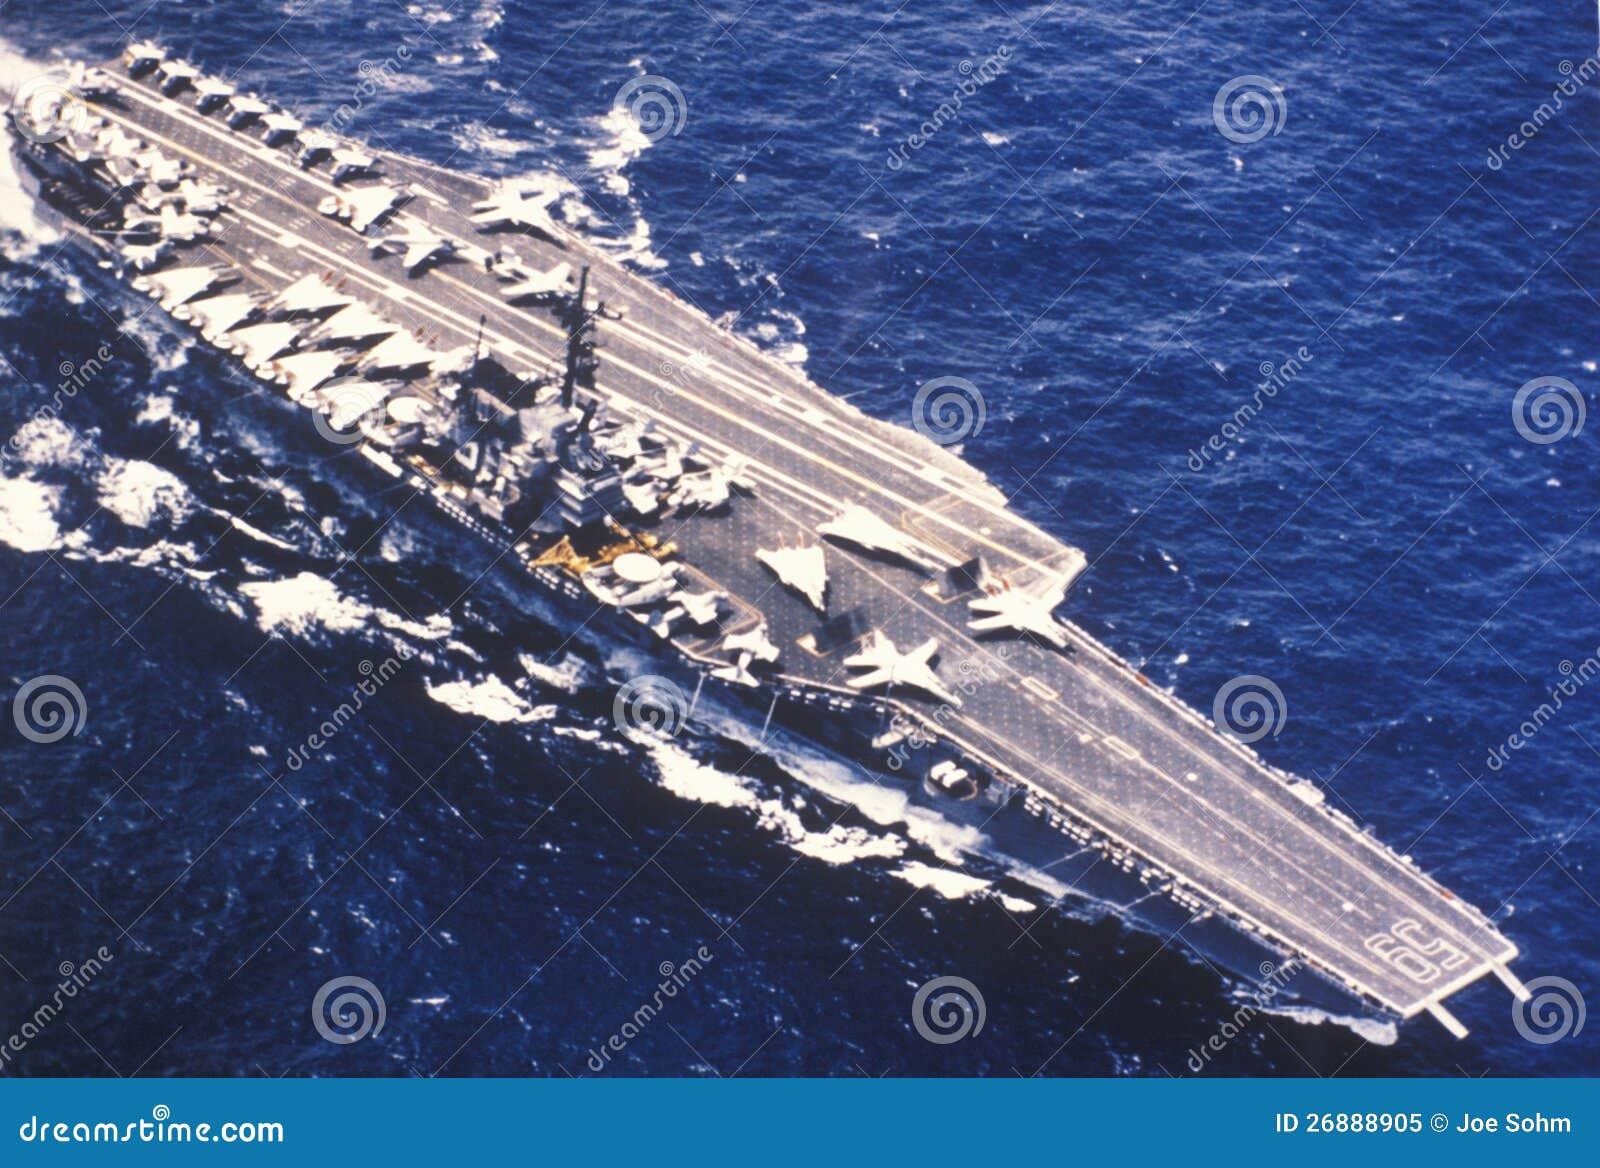 Porta aviões De USS Forrestal Imagem Editorial Imagem: 26888905 #81A229 1300 966